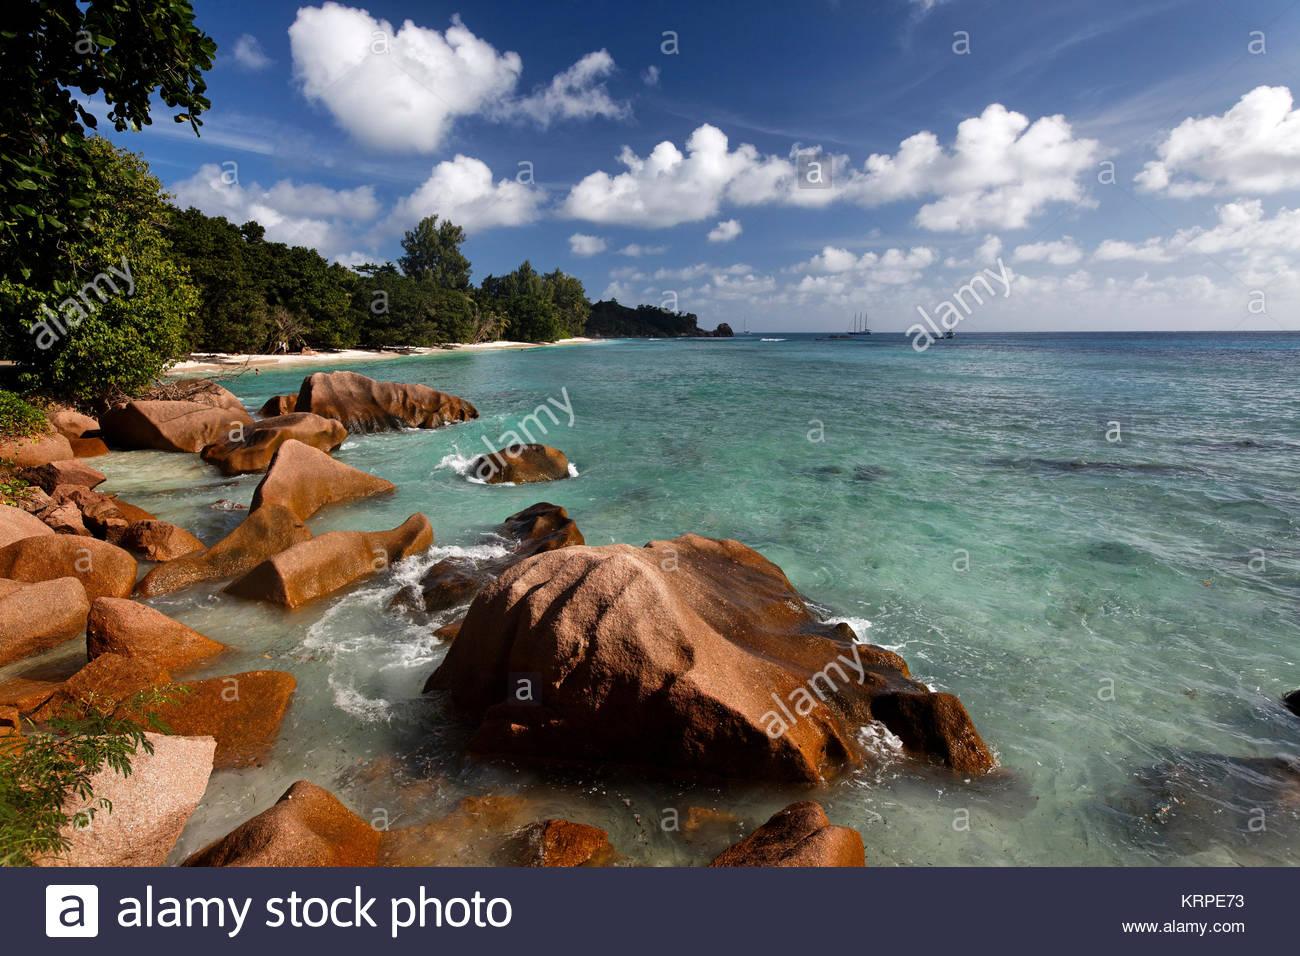 Granitfelsen am Ufer am Anse Severe, La Digue, Seychellen, Indischer Ozean, Afrika Stockbild